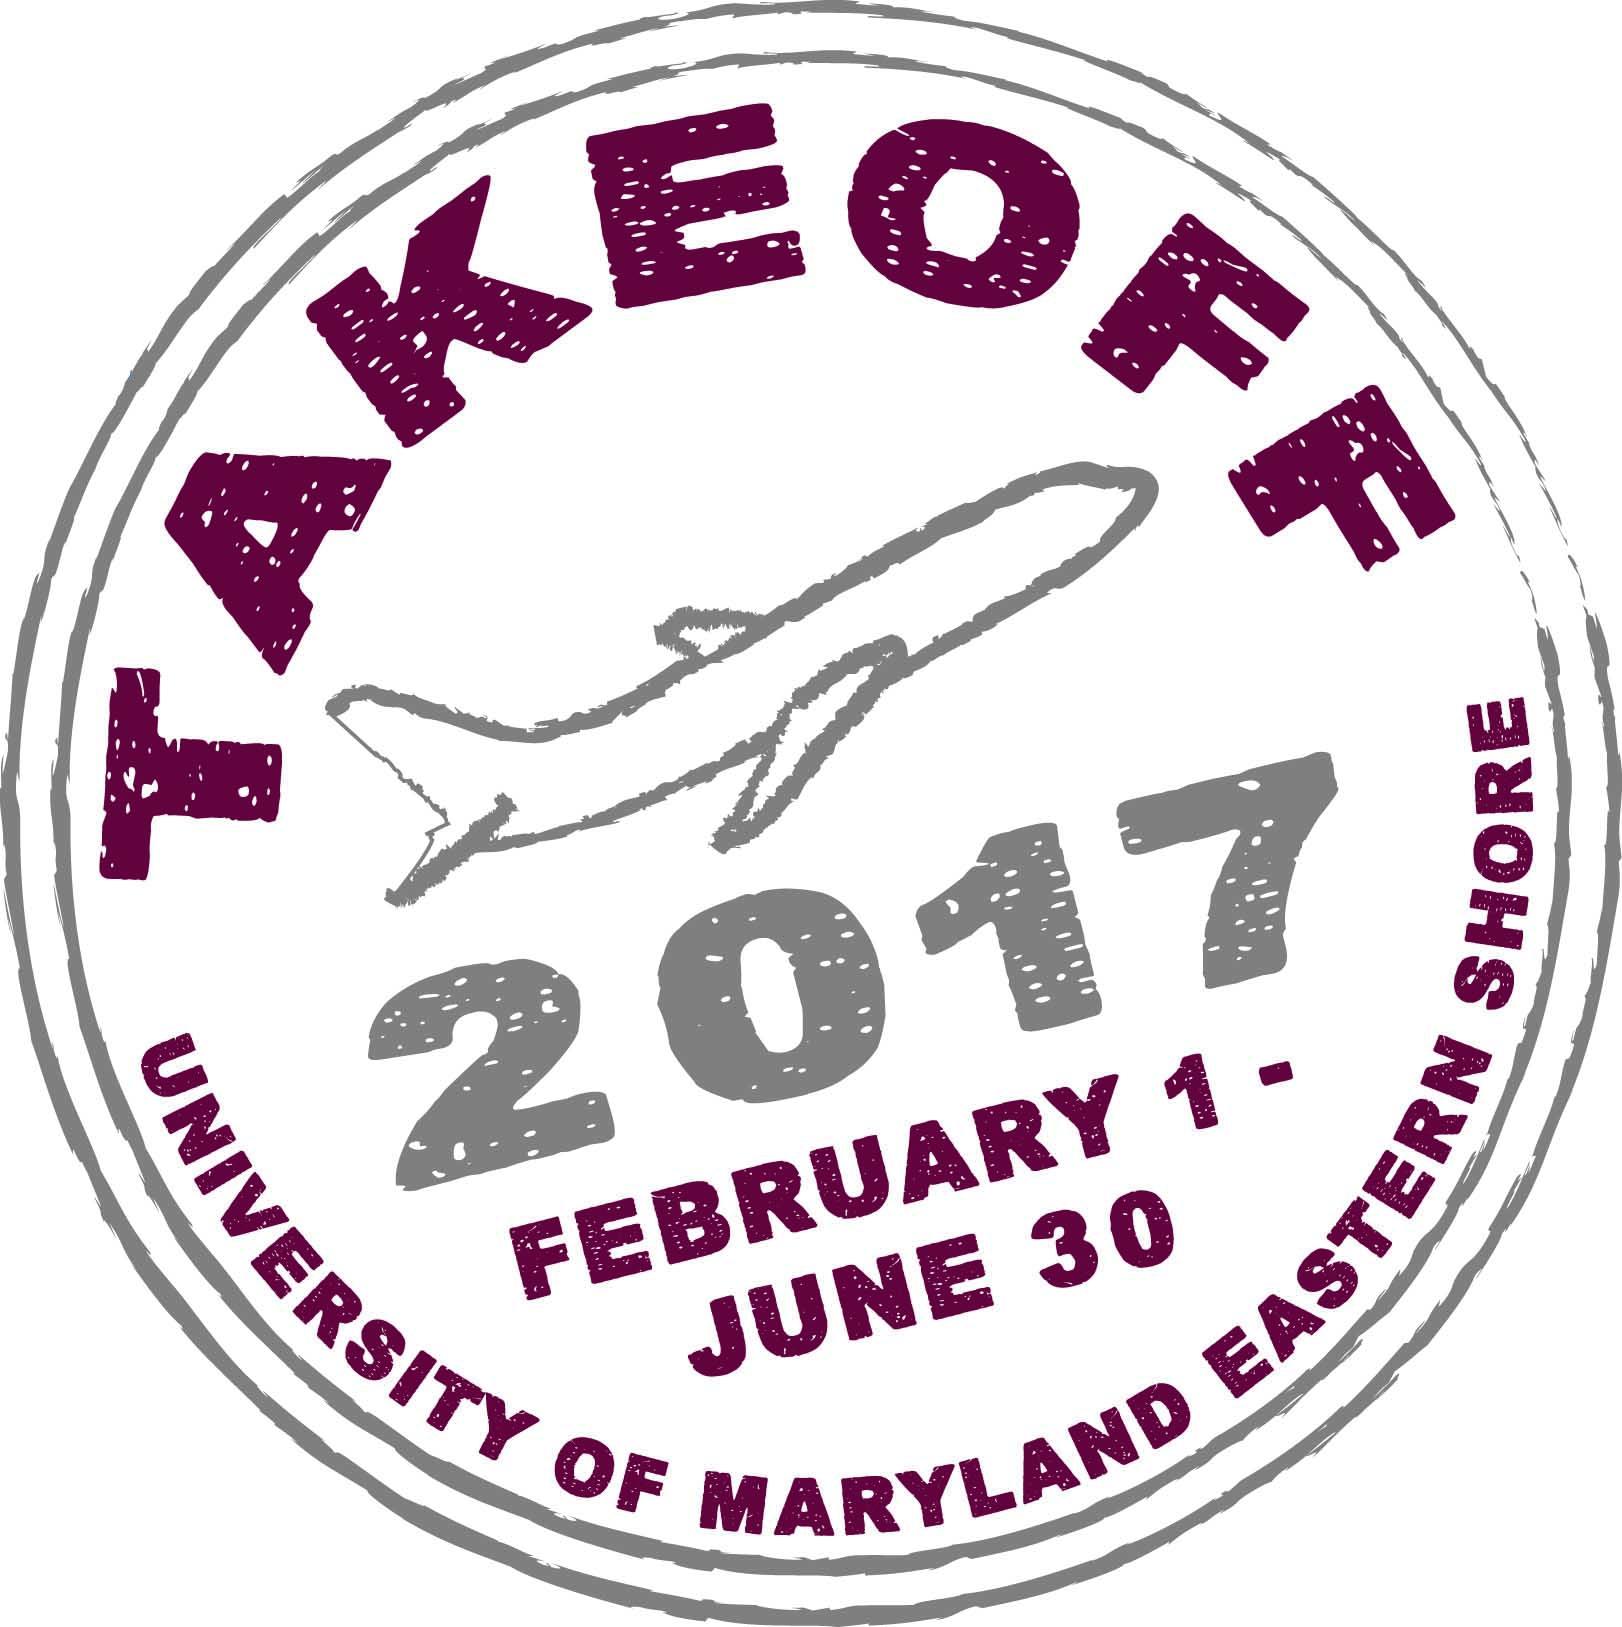 Classic takeoff logo